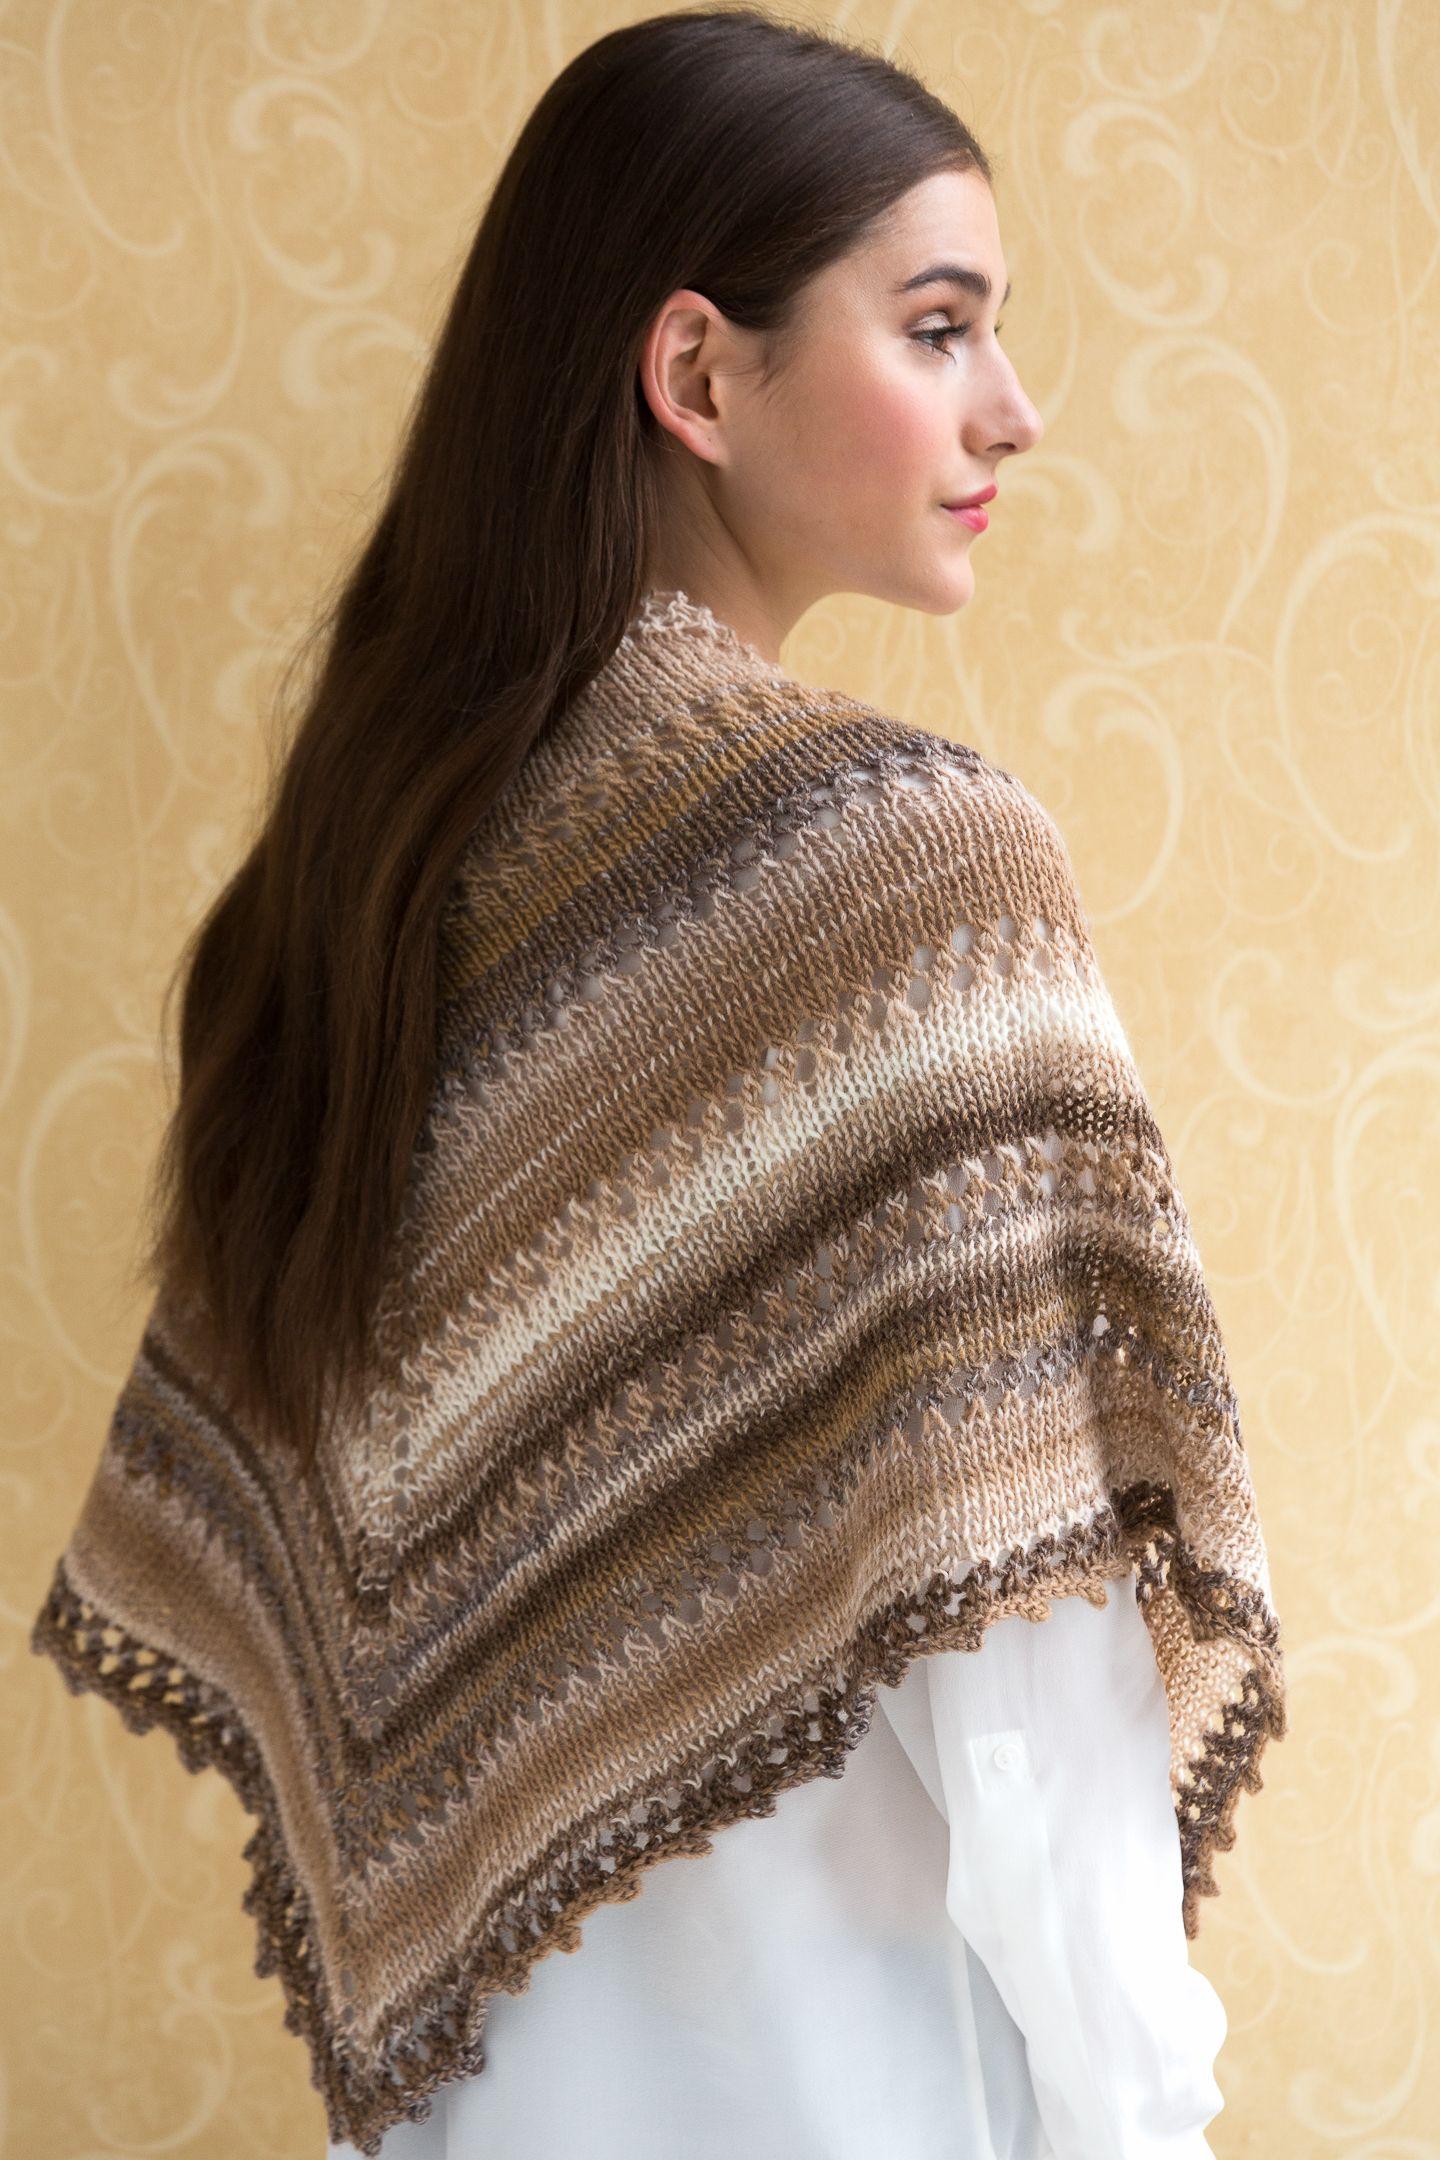 Simple Knit Shawl in NAVAJO a great self striping wool/acrylic yarn ...